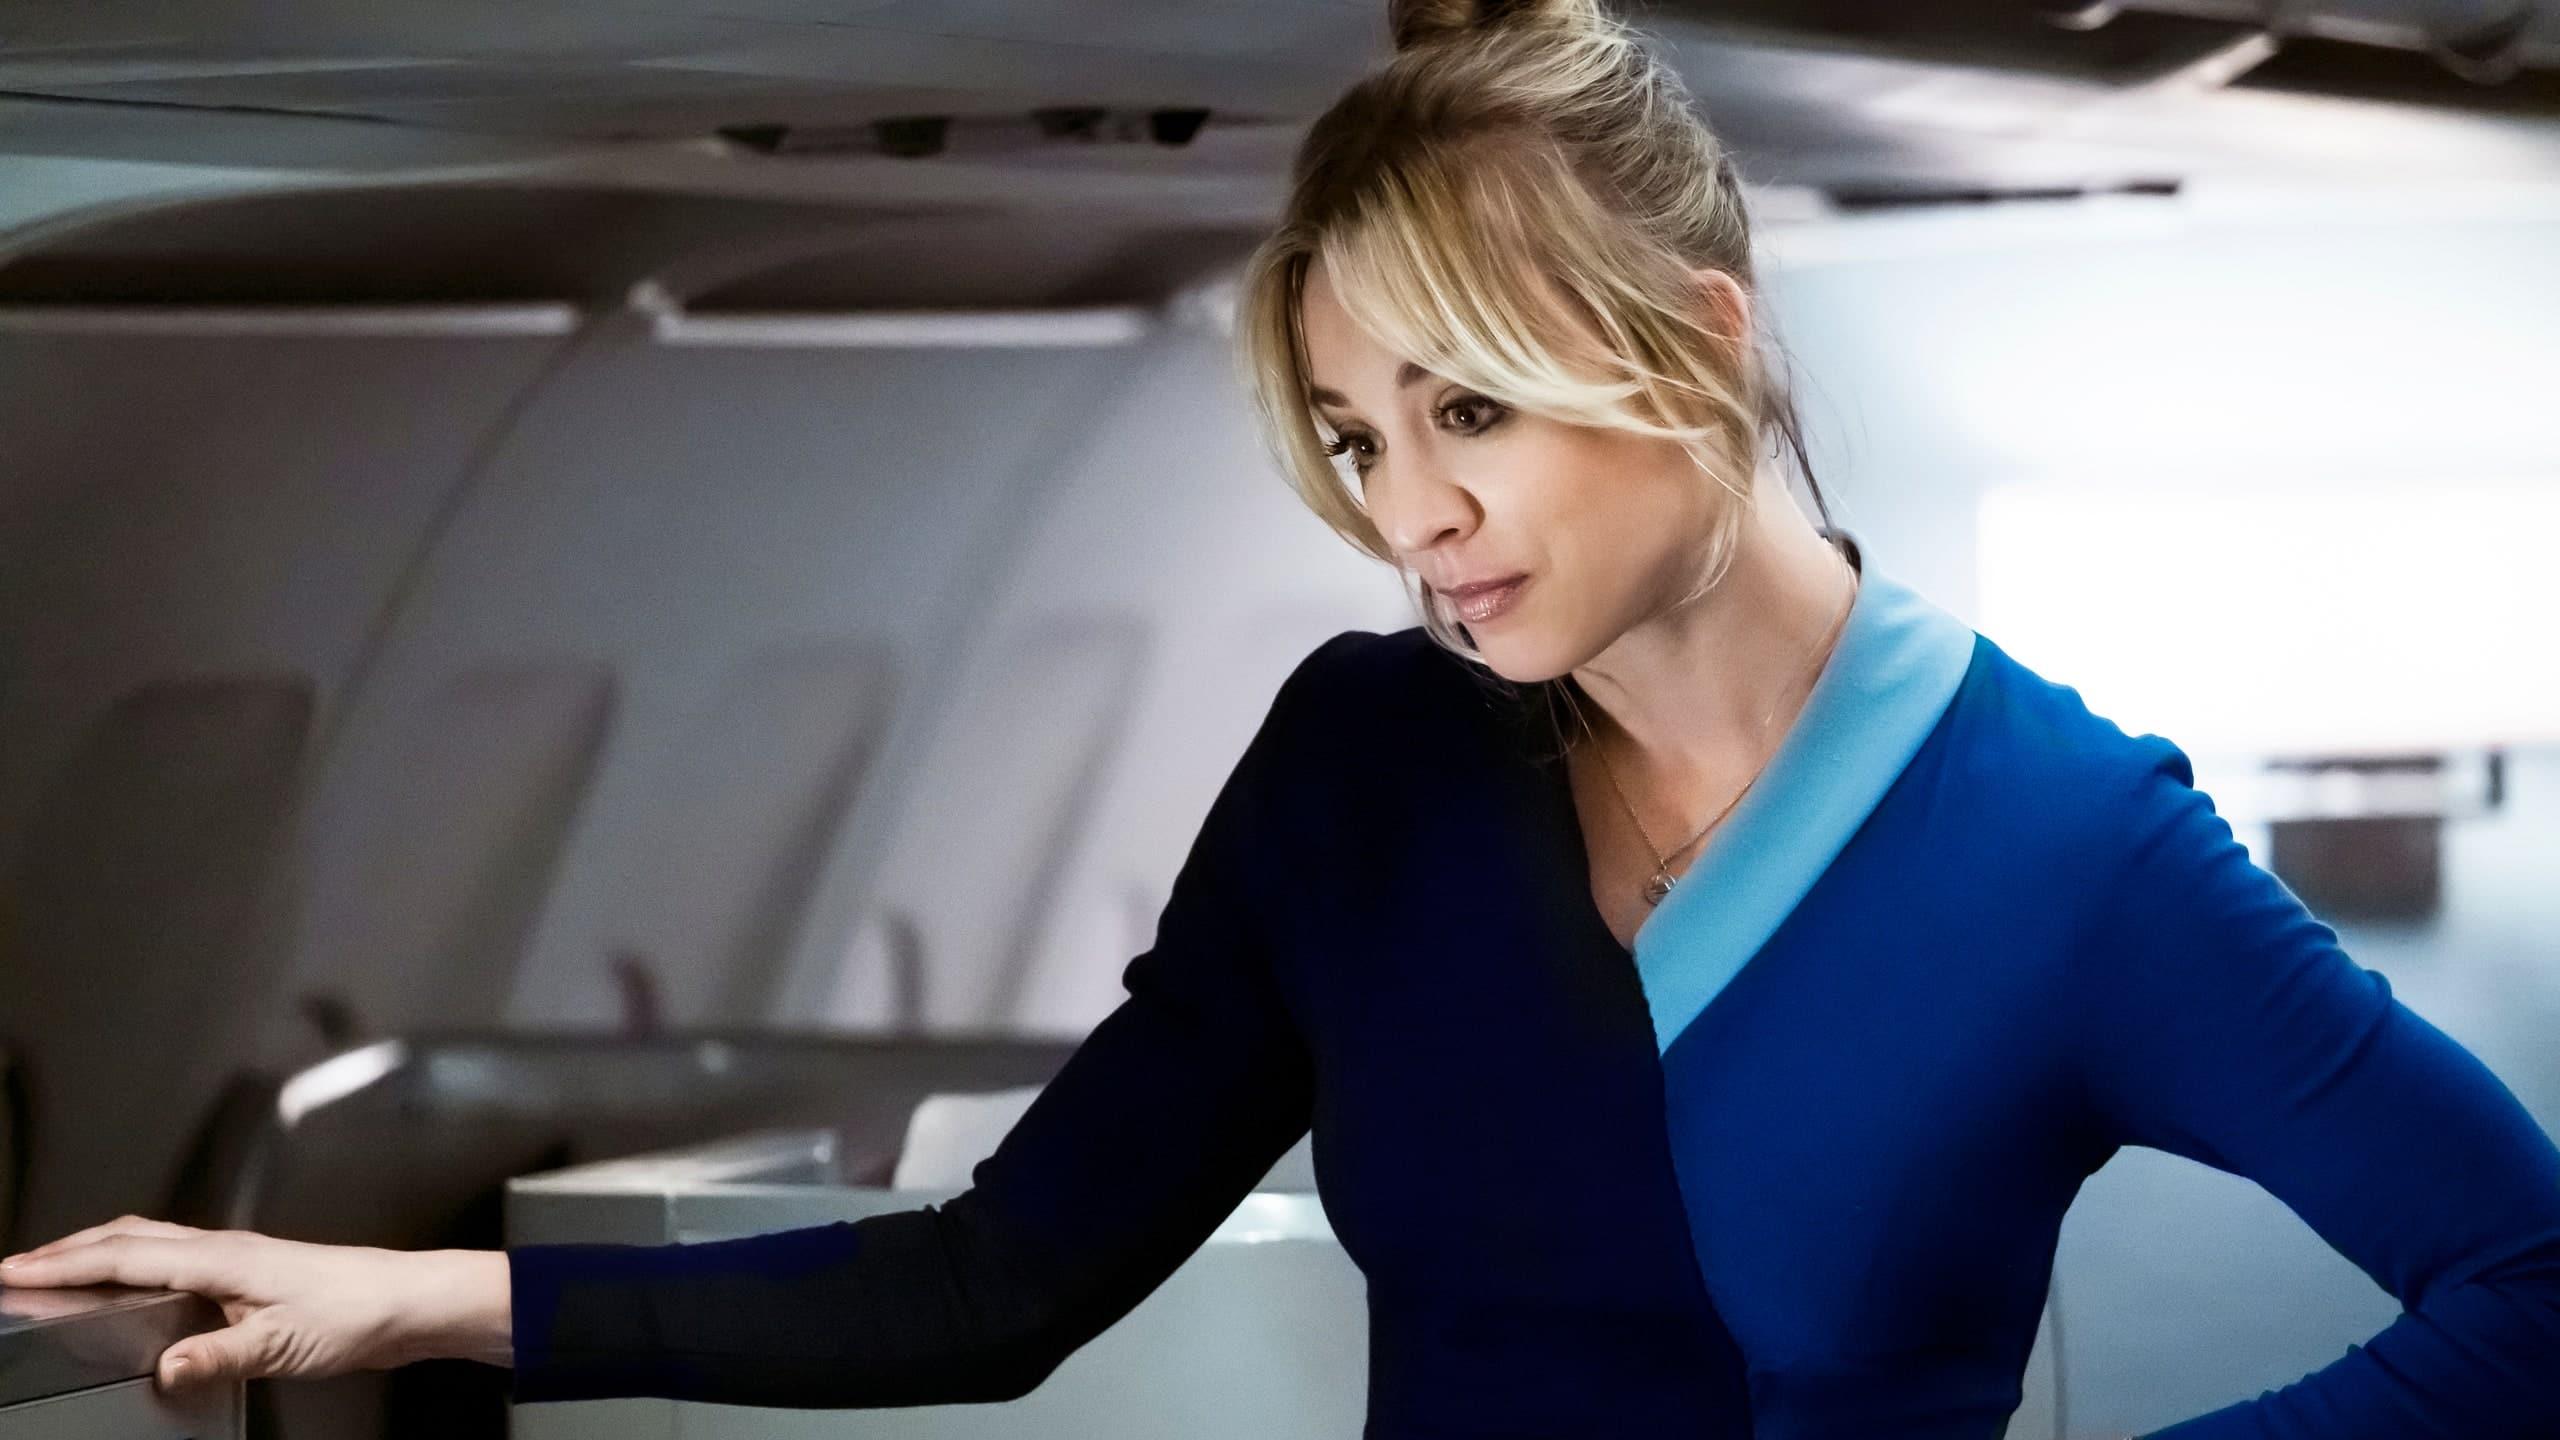 Trailer: The Flight Attendant (2020)